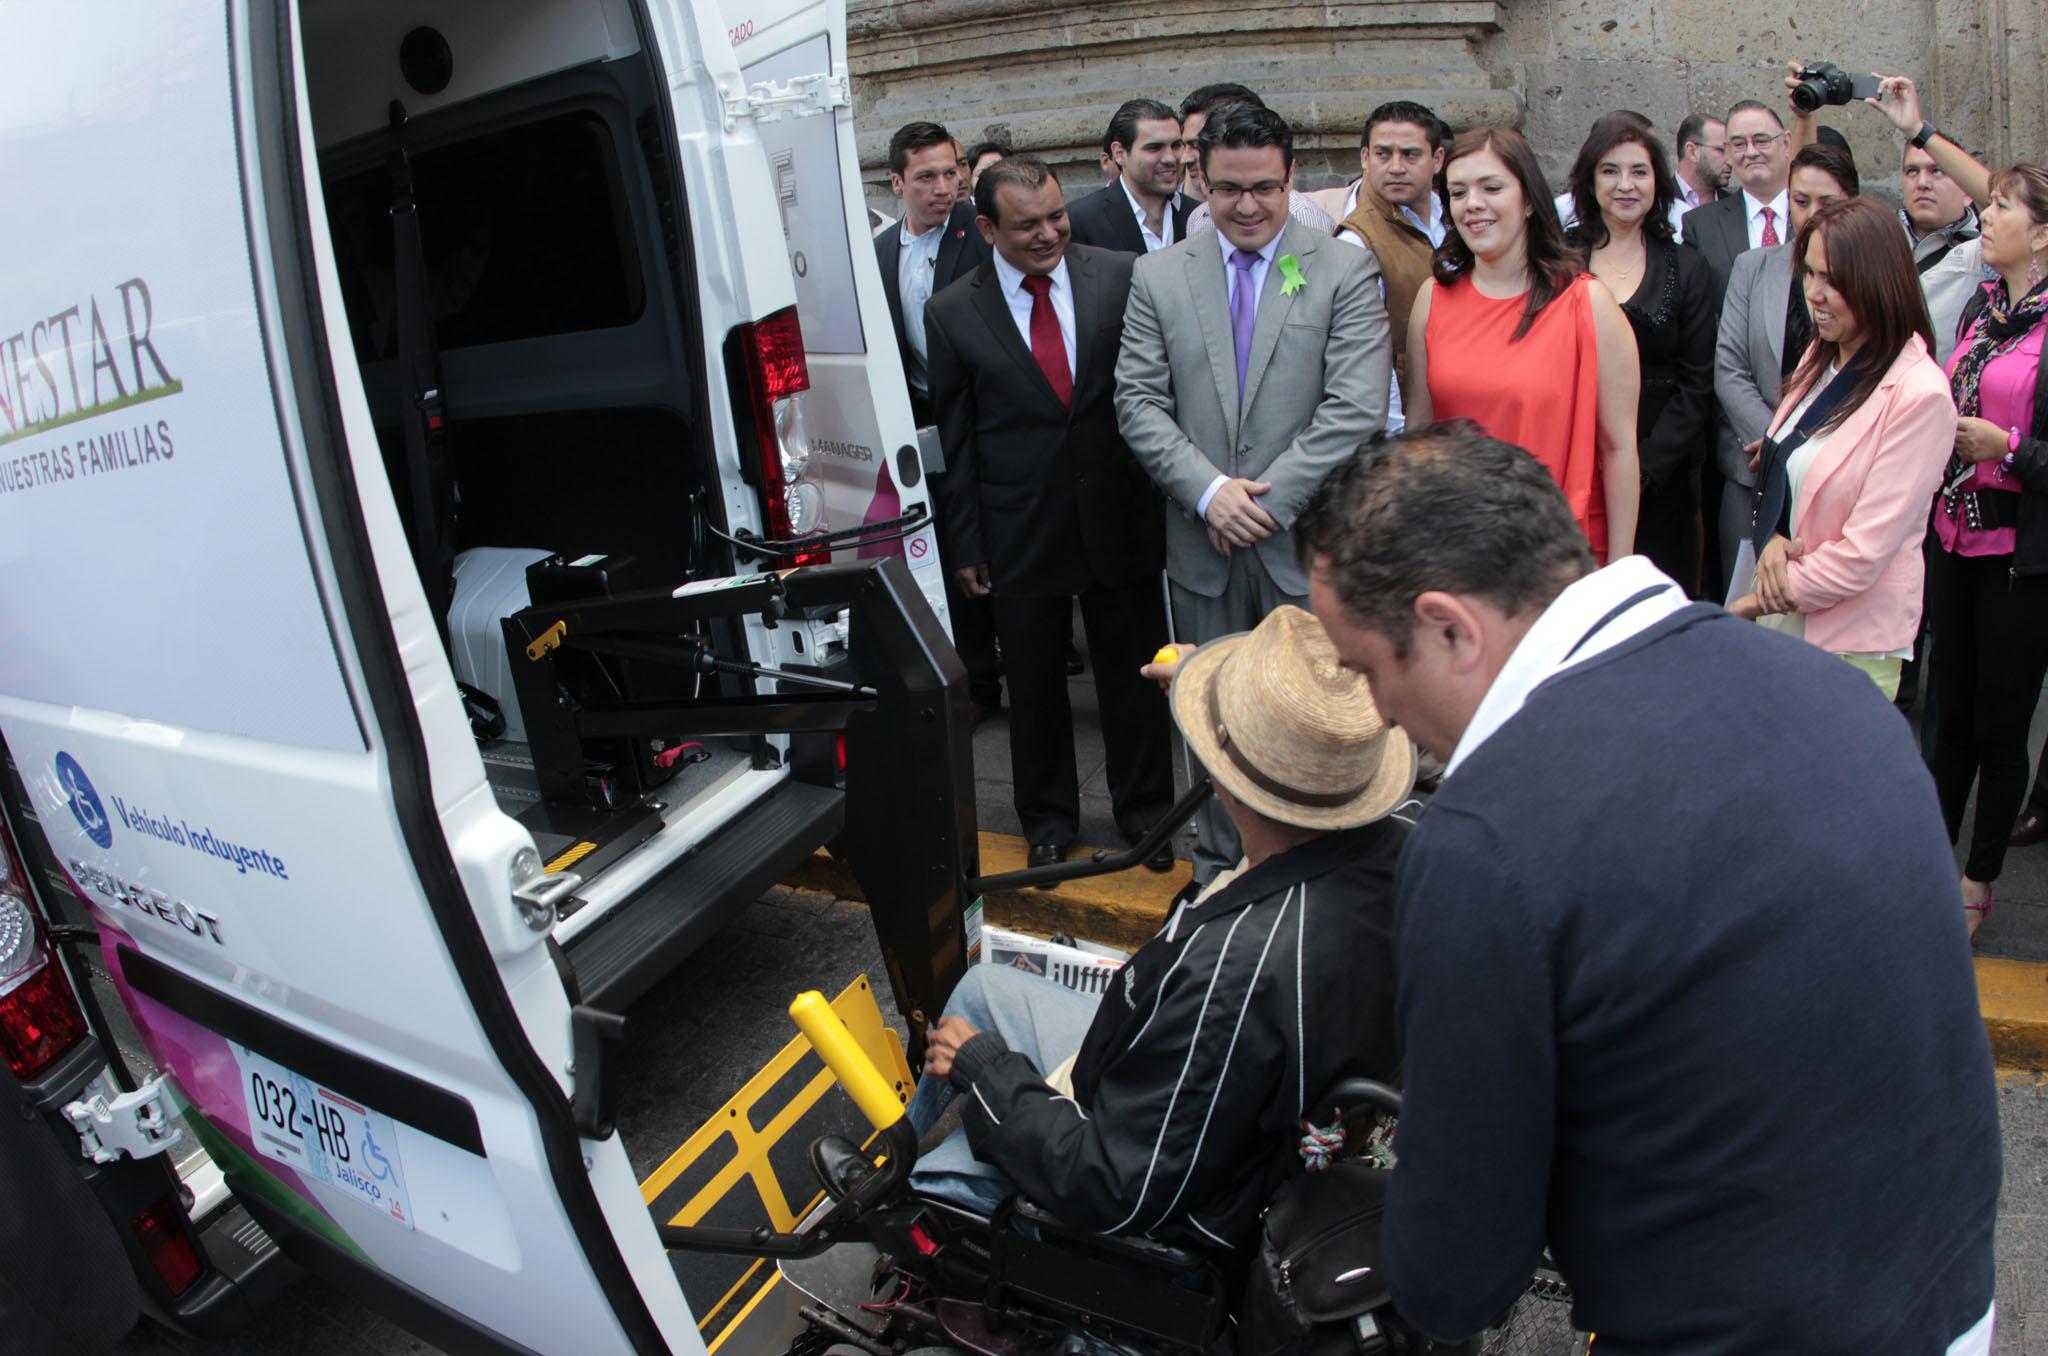 Presenta Gobernador programa Jalisco Incluyente